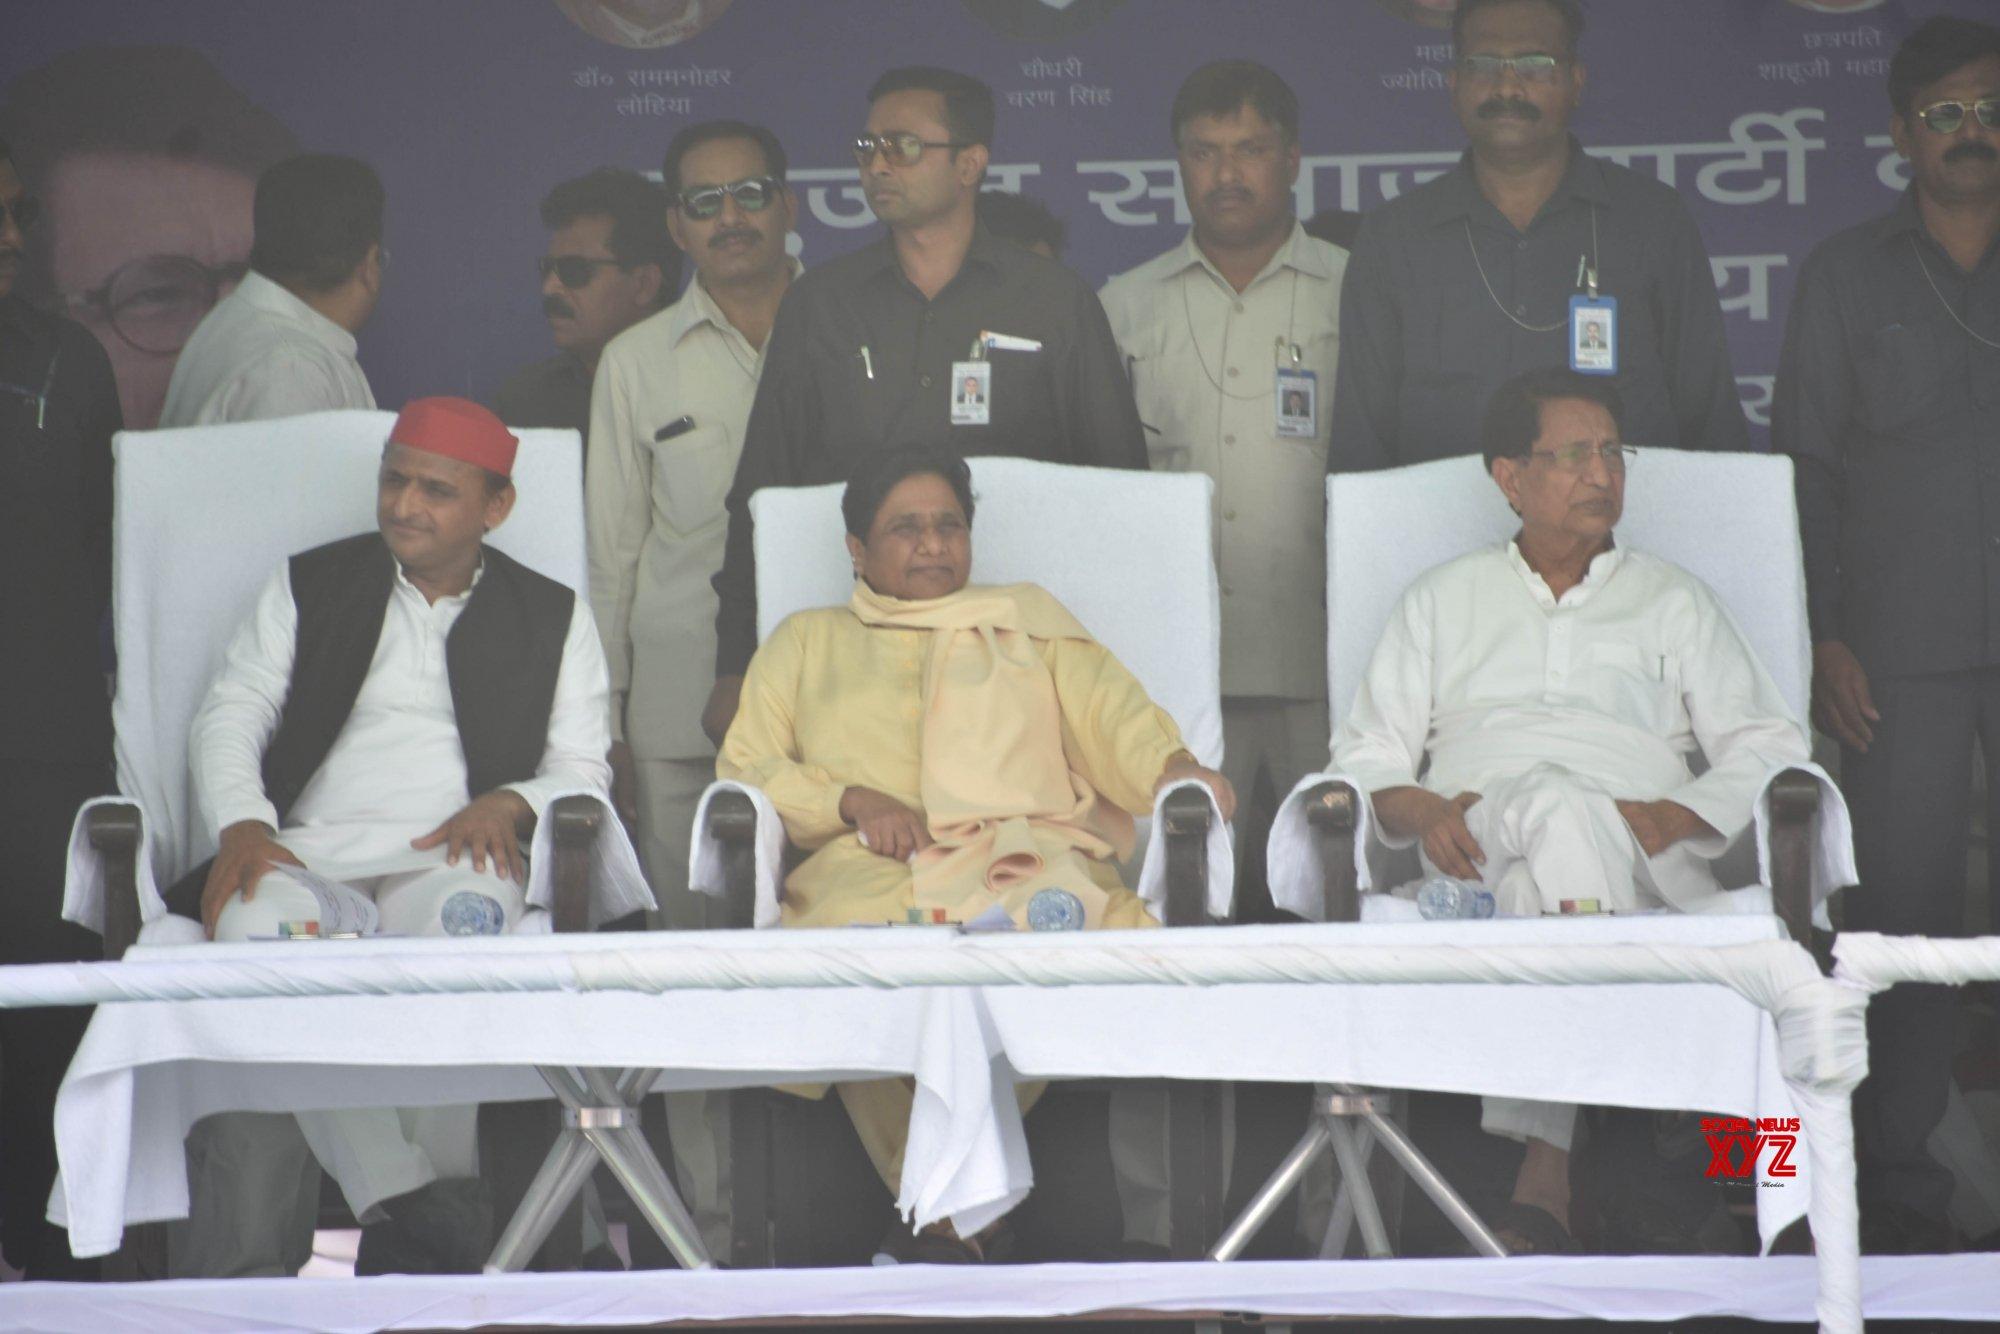 Varanasi: Akhilesh Yadav, Mayawati, Ajit Singh during joint public rally (Batch - 2) #Gallery